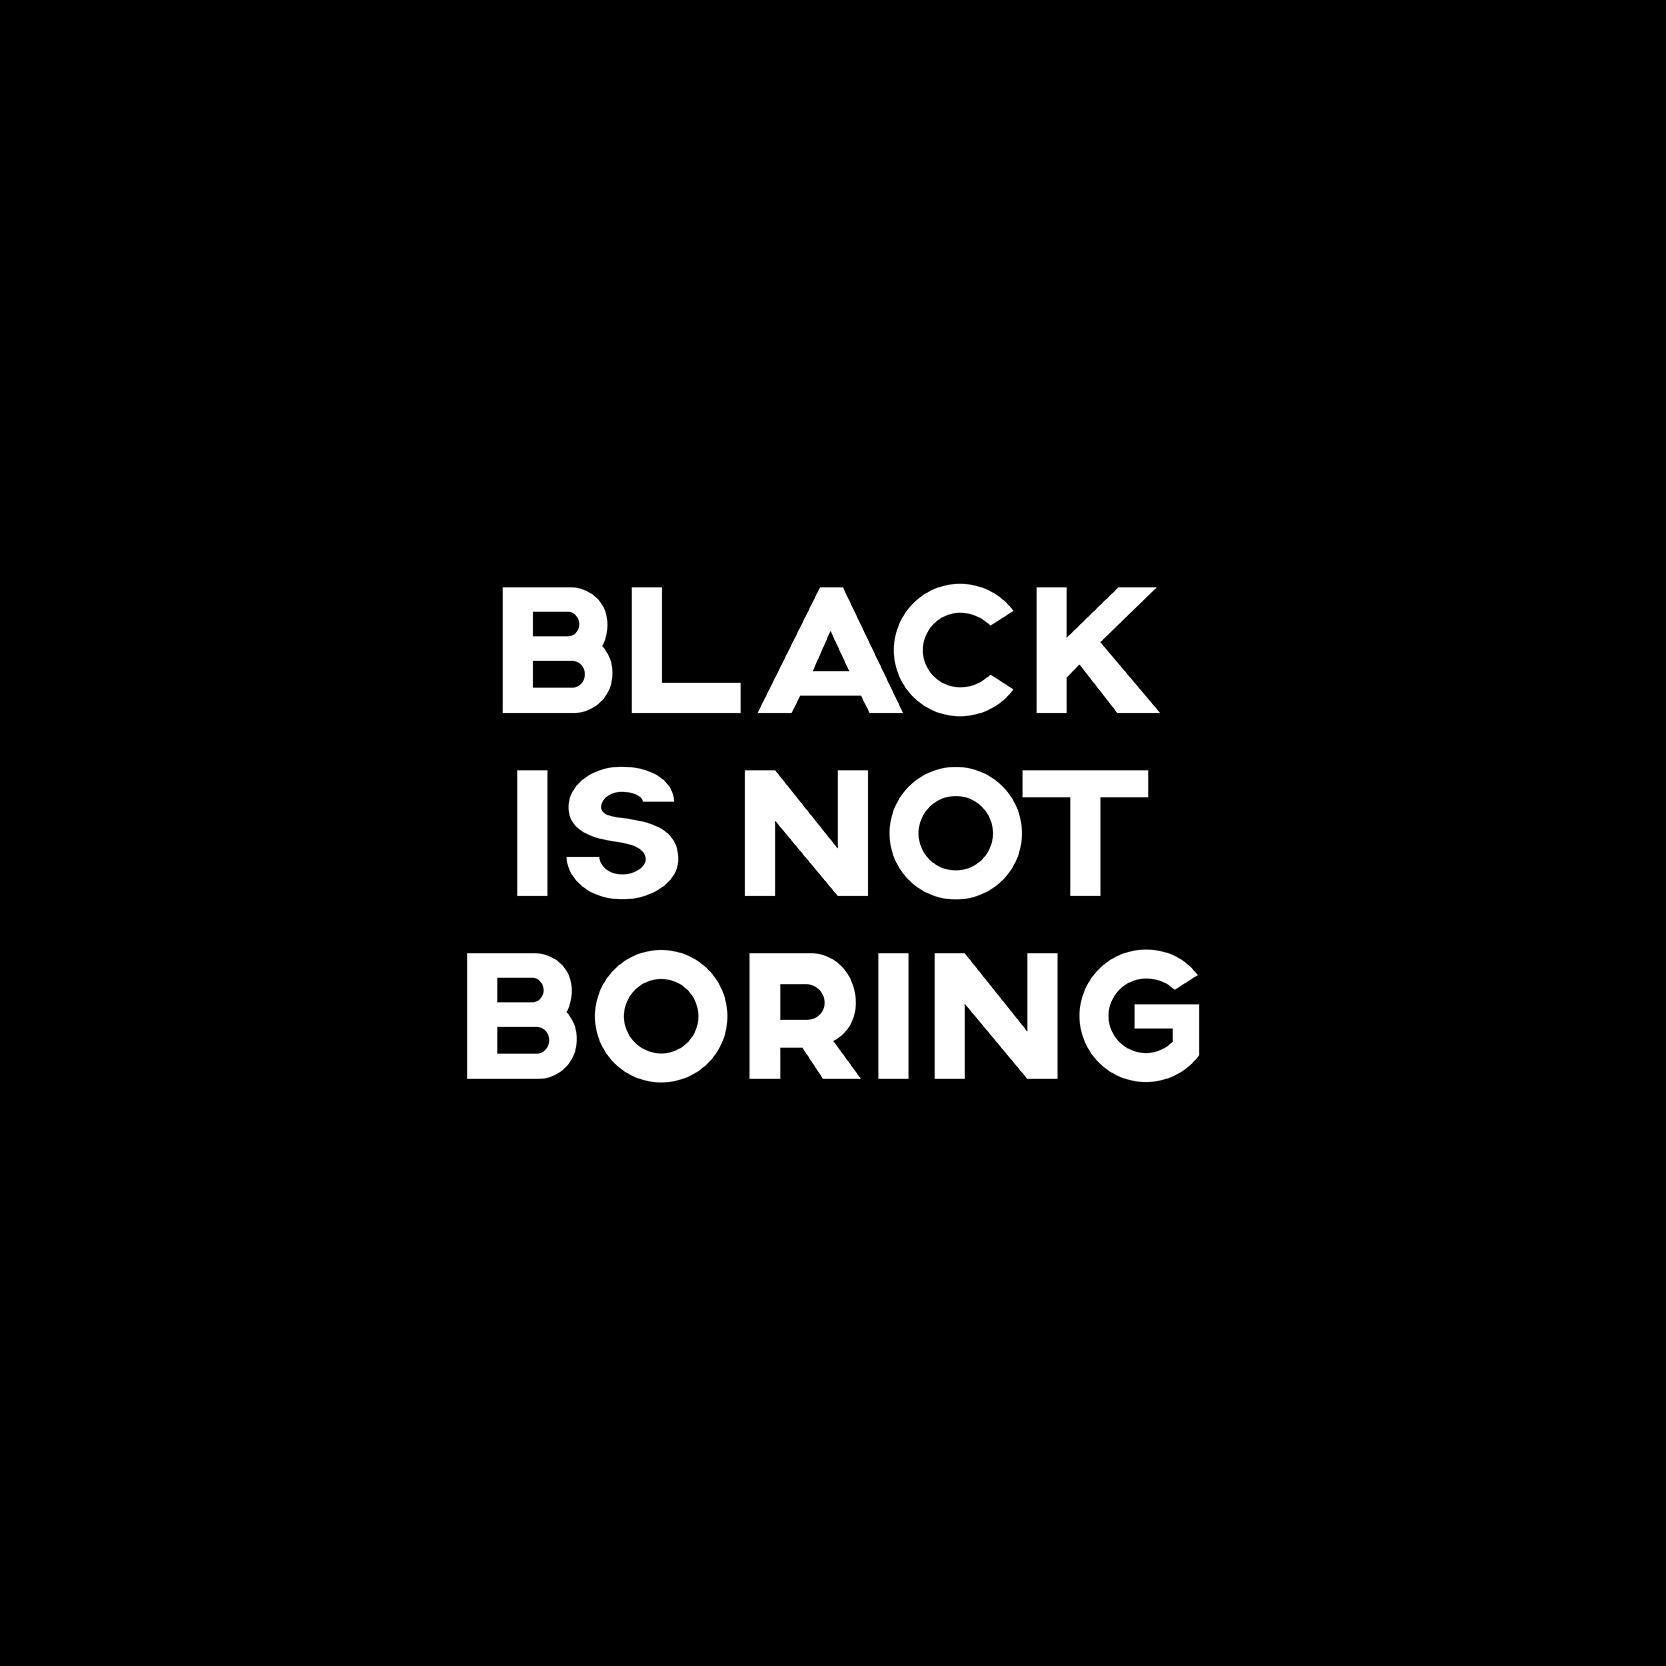 JekabsonsDotCom_BlackIsNotBoring